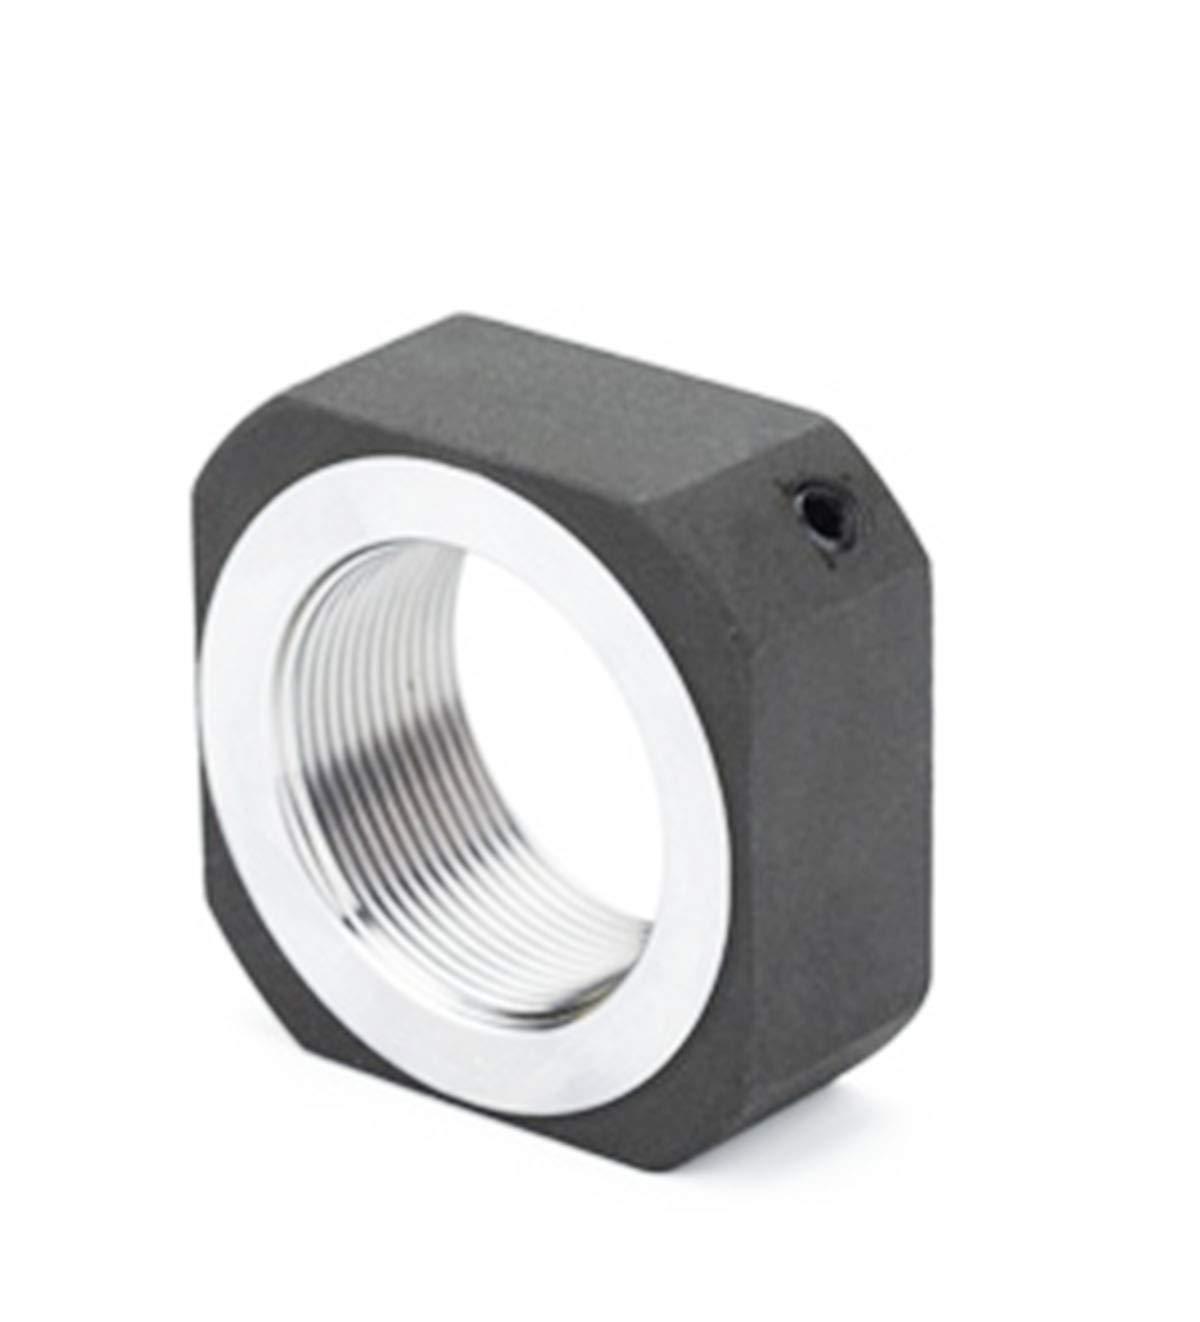 2pcs//lot RN M35X1.5P RN precision locking square nut